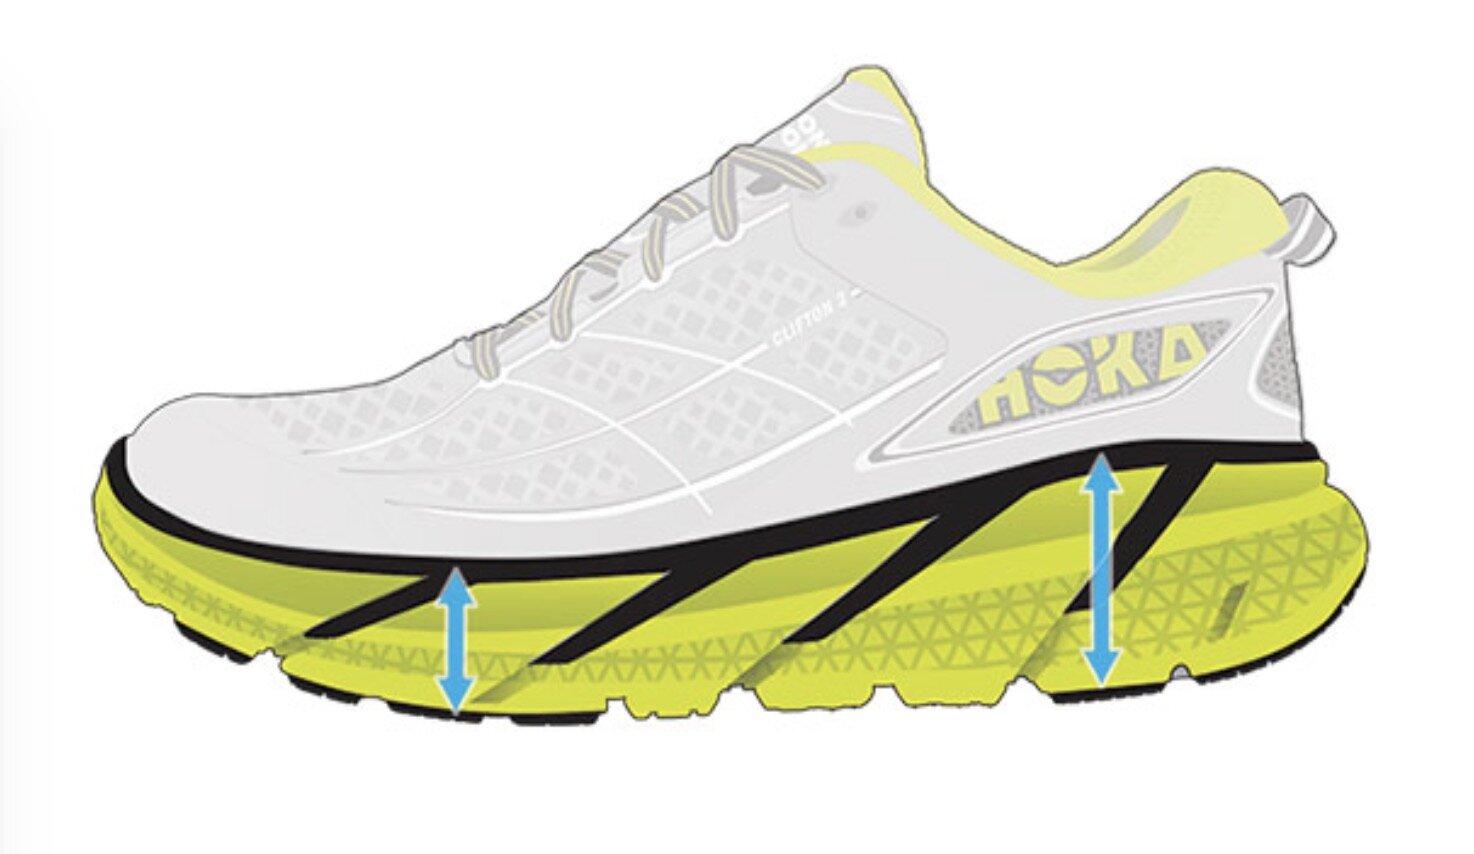 Rocker Running Shoes-Hoka One One — Dr